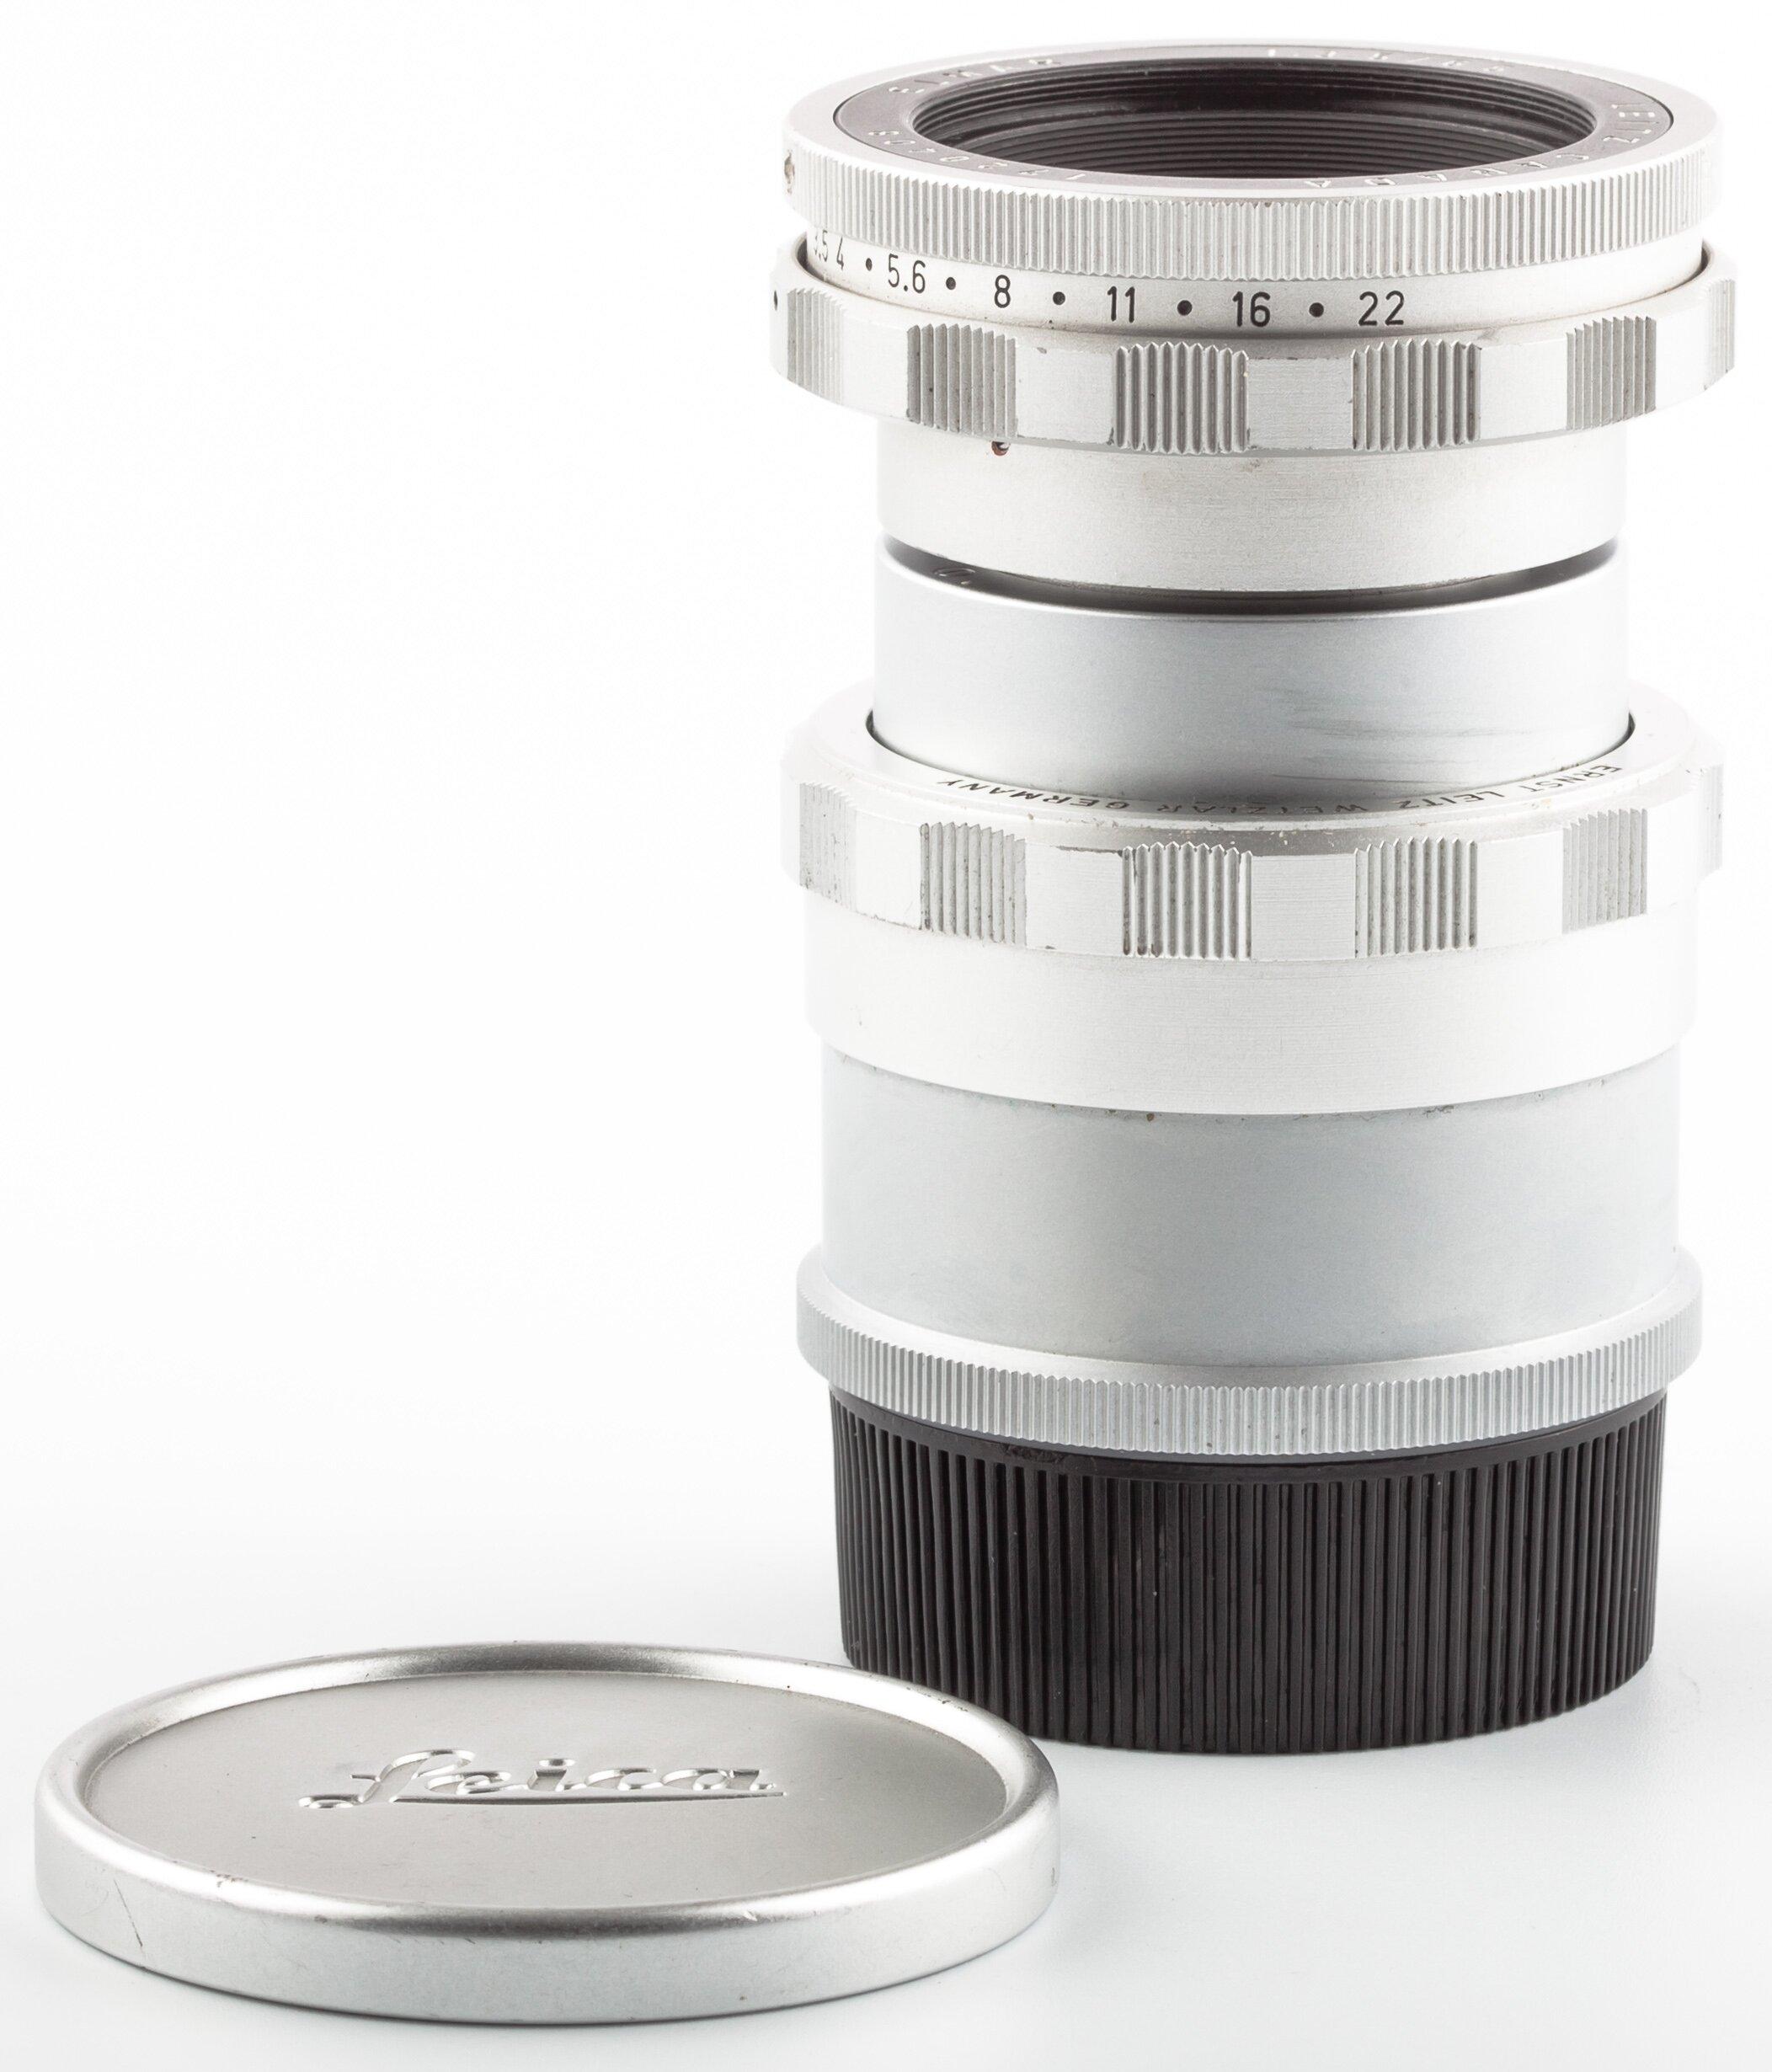 Leitz Leica M Elmar 65mm F3,5 Visoflex silver